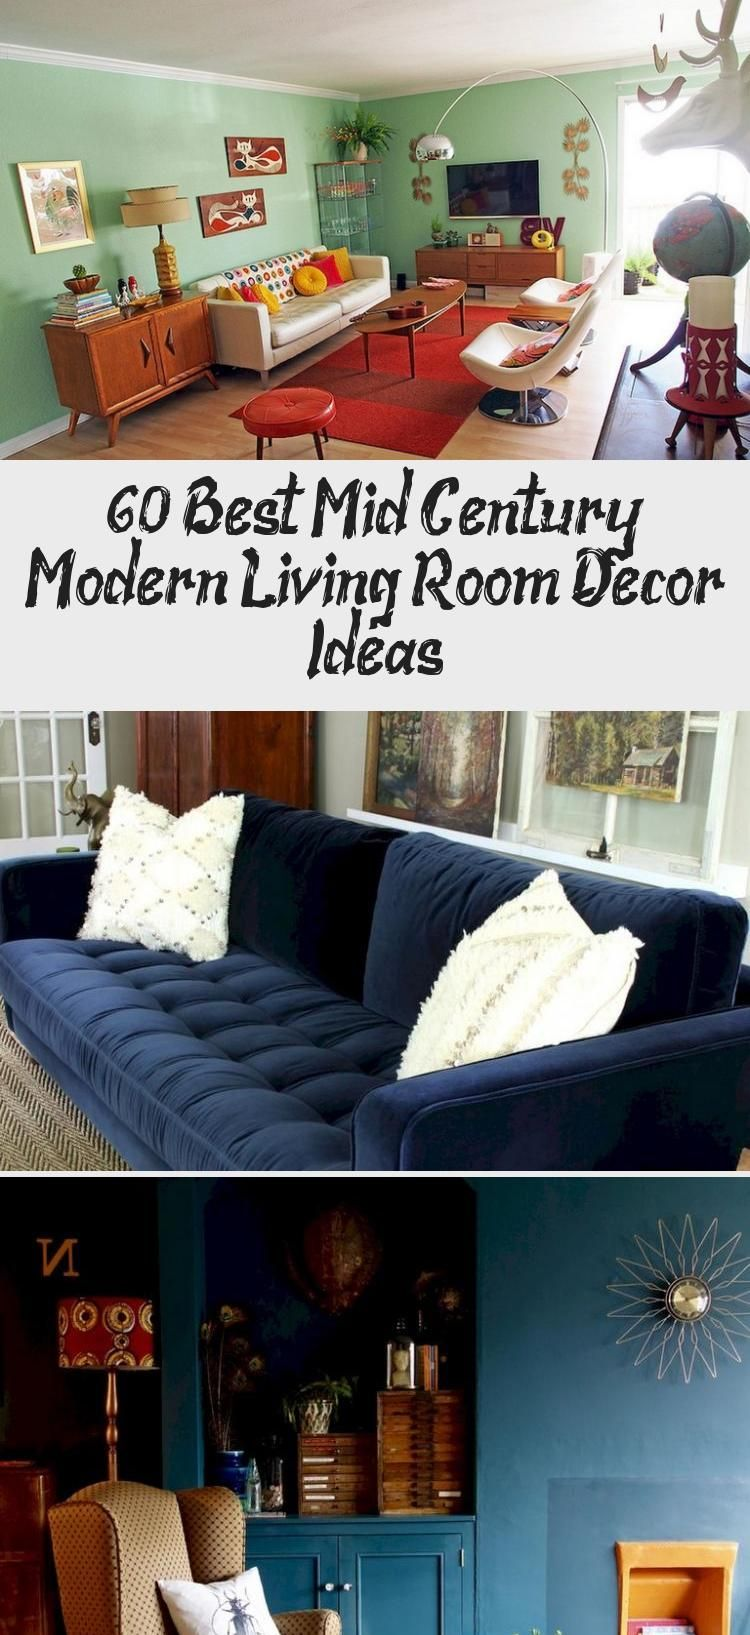 60 Best Mid Century Modern Living Room Decor Ideas